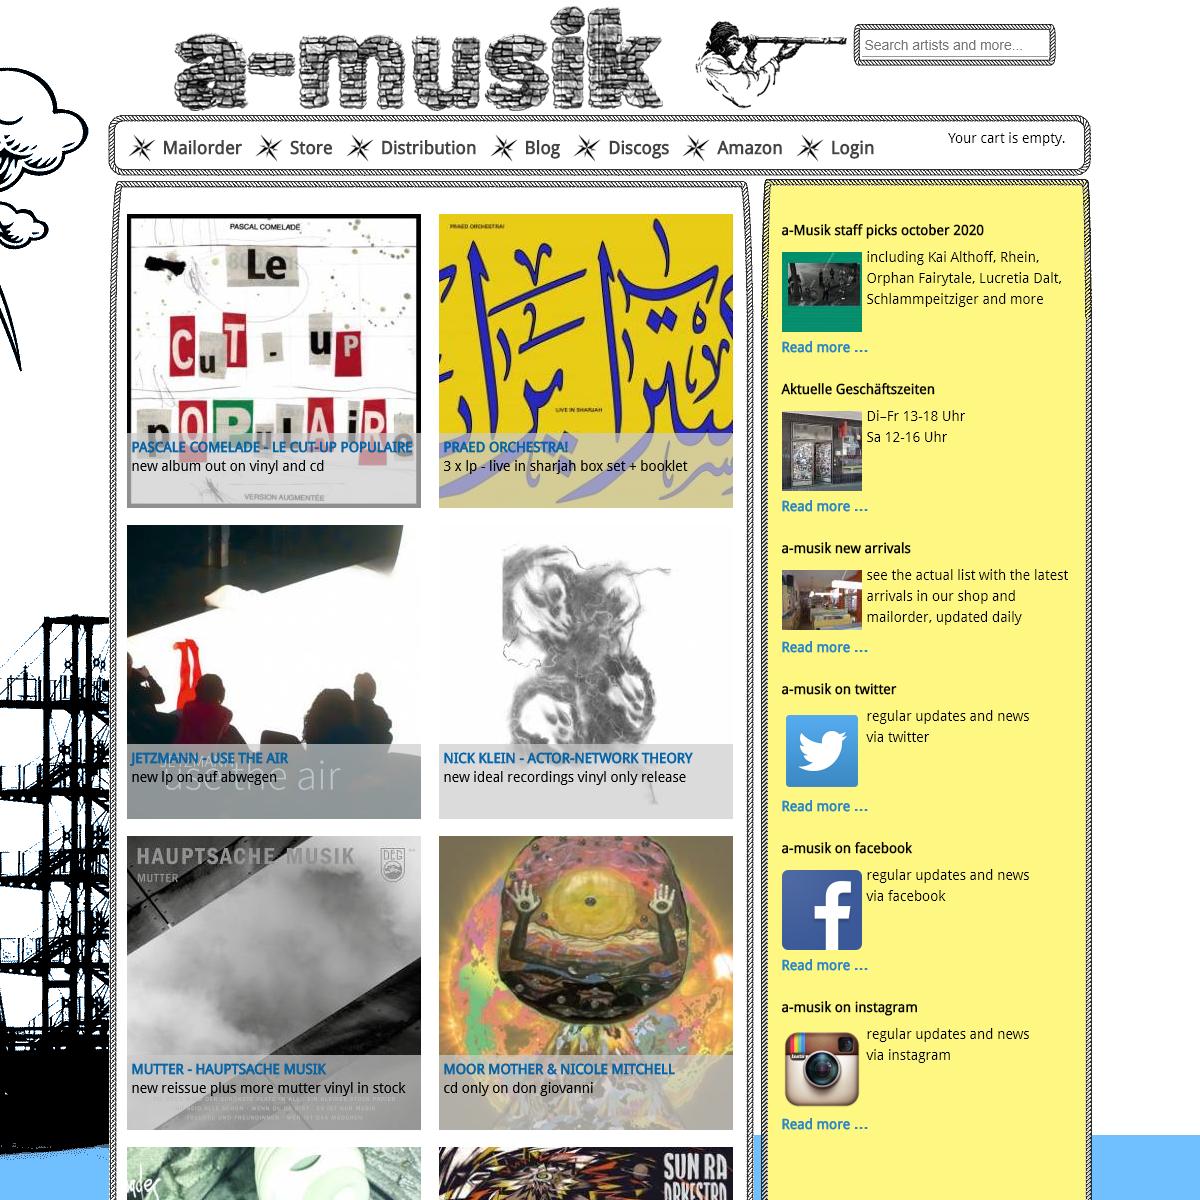 a-musik- mailorder, distribution, recordshop, label - a-musik